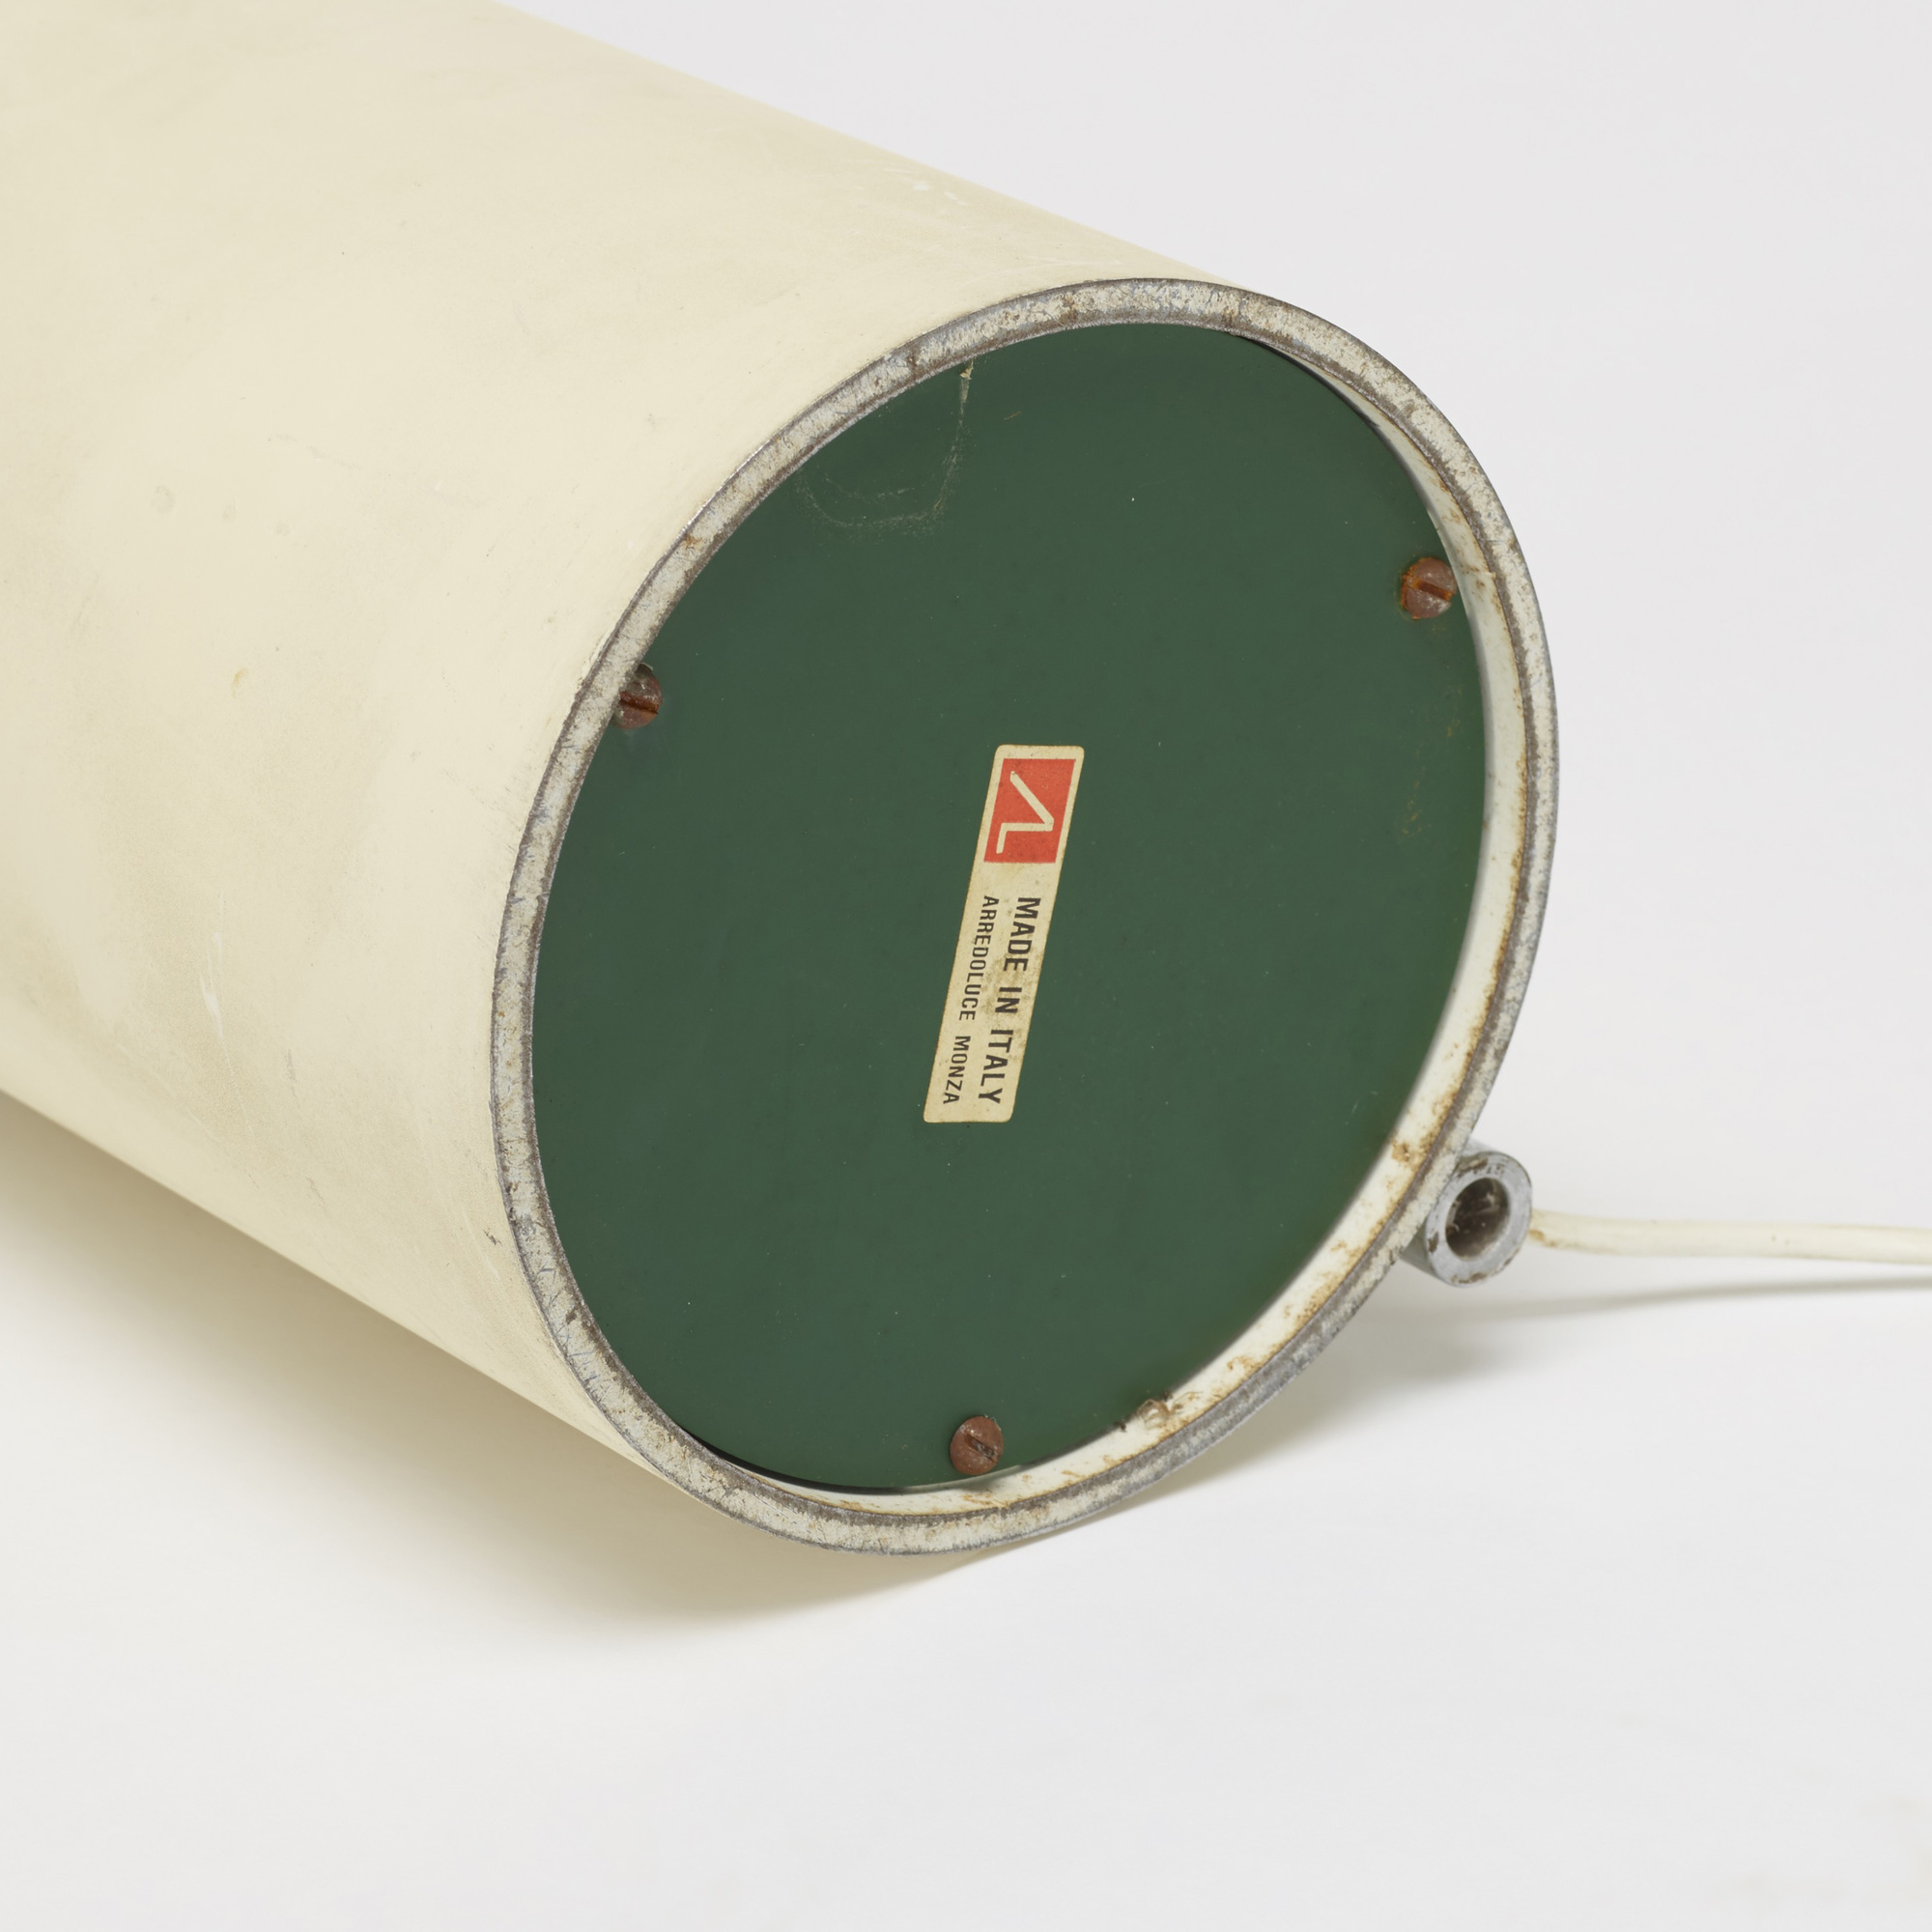 311: Angelo Lelii / Filosphera floor lamp (4 of 4)